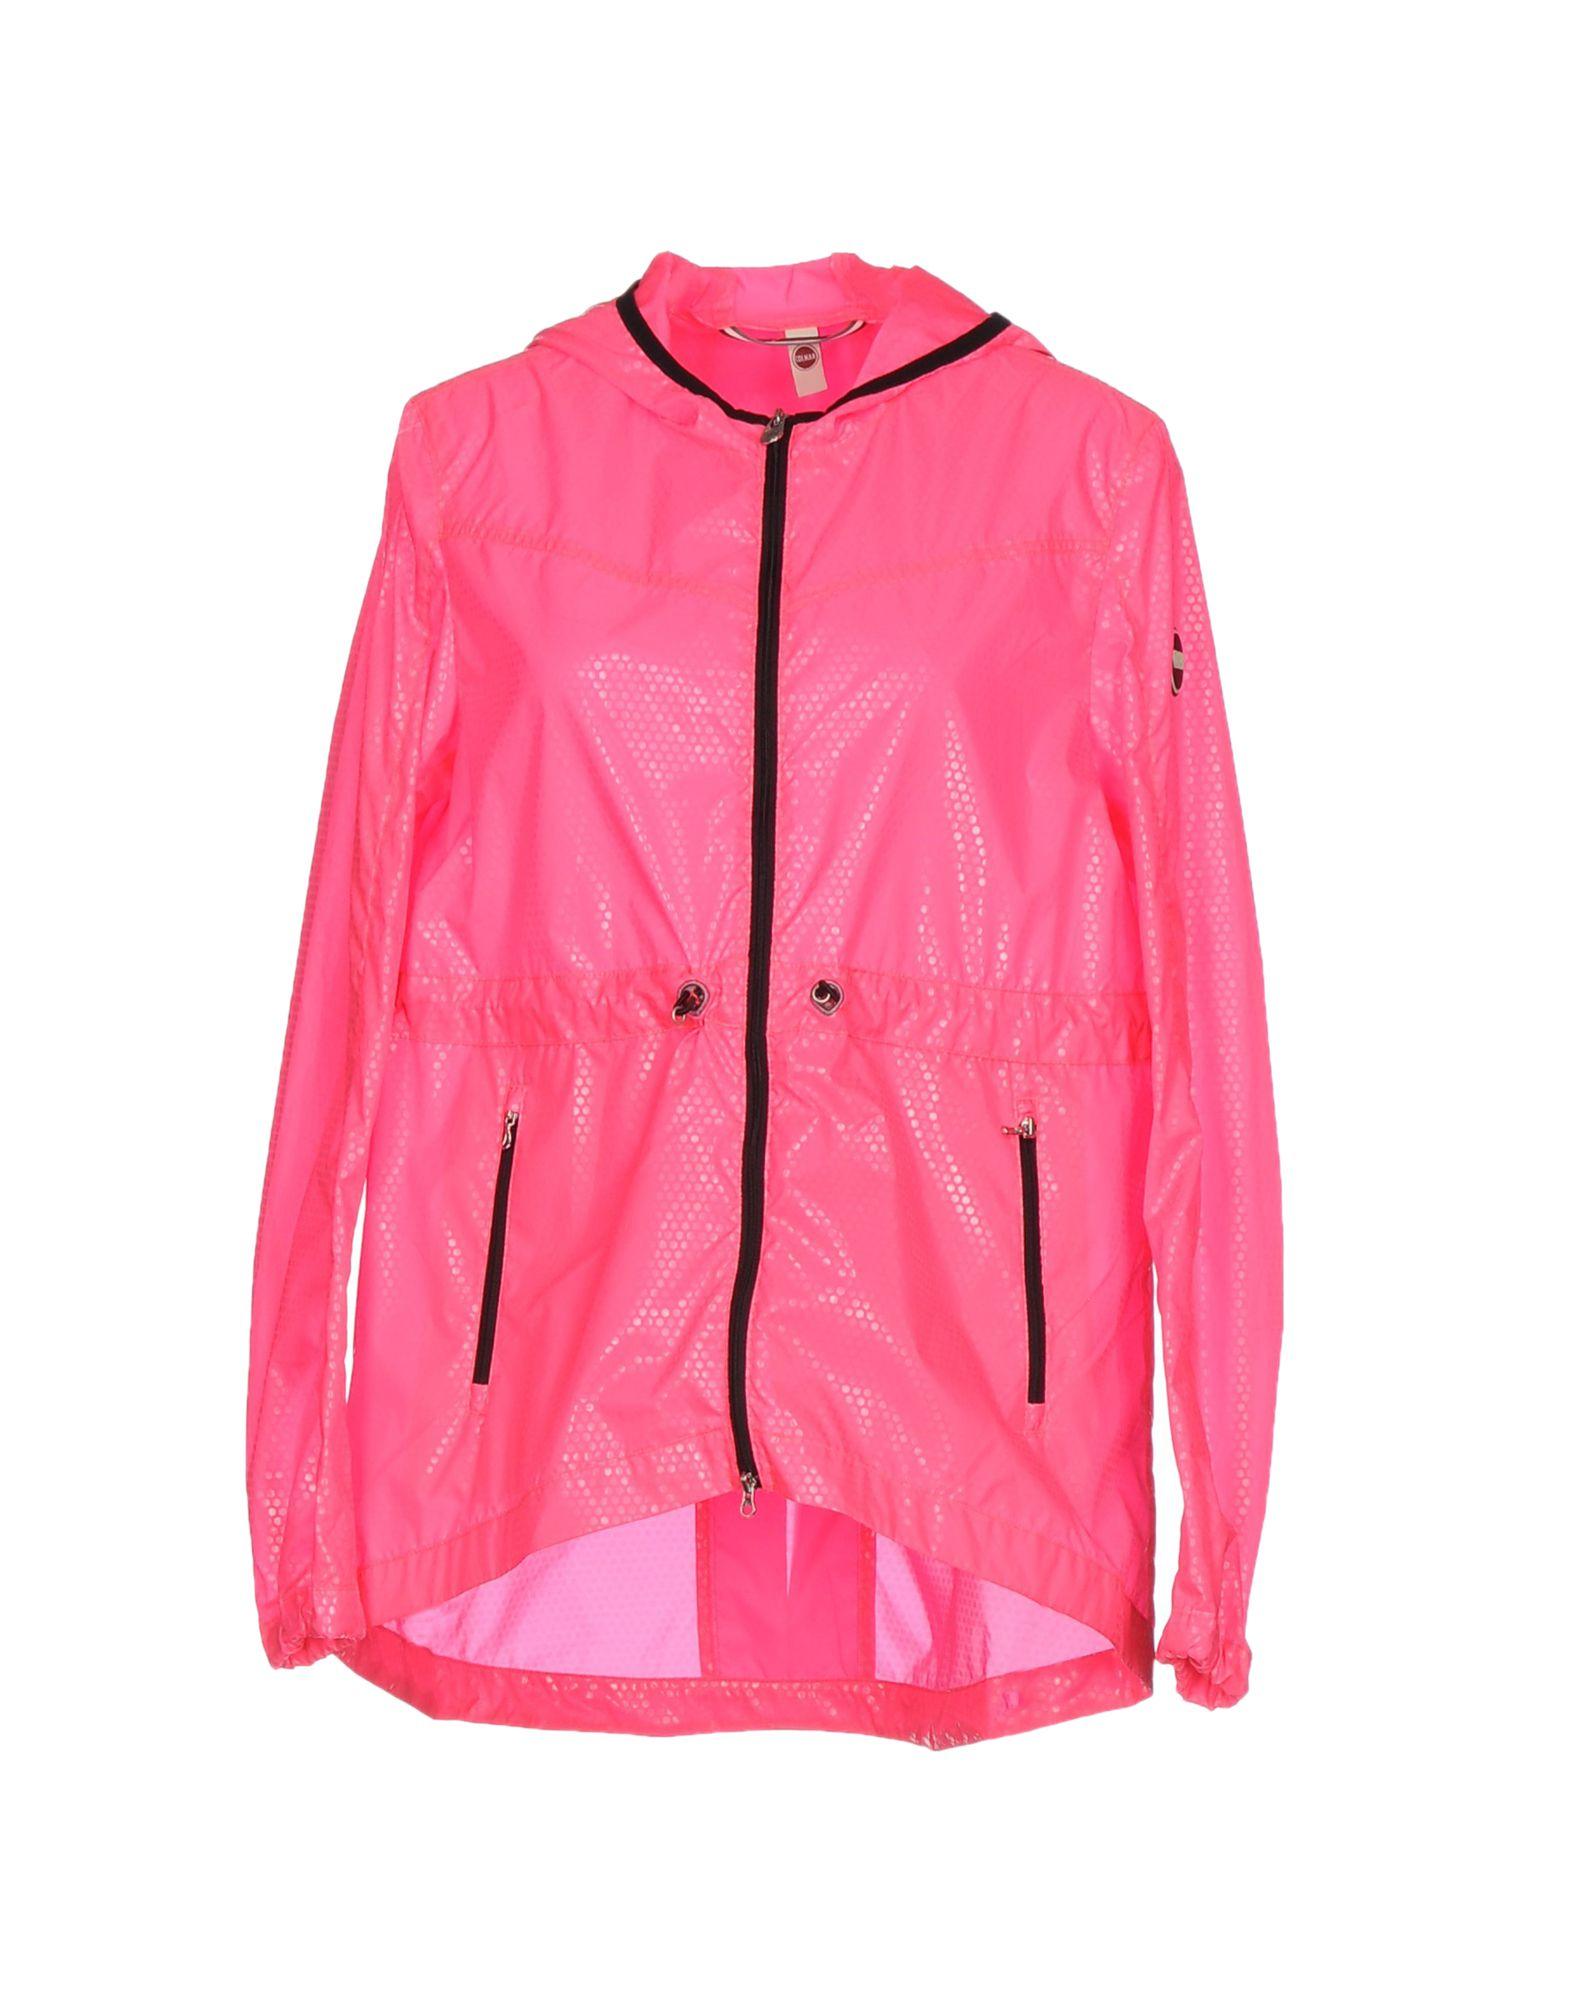 COLMAR ORIGINALS Jacket in Fuchsia